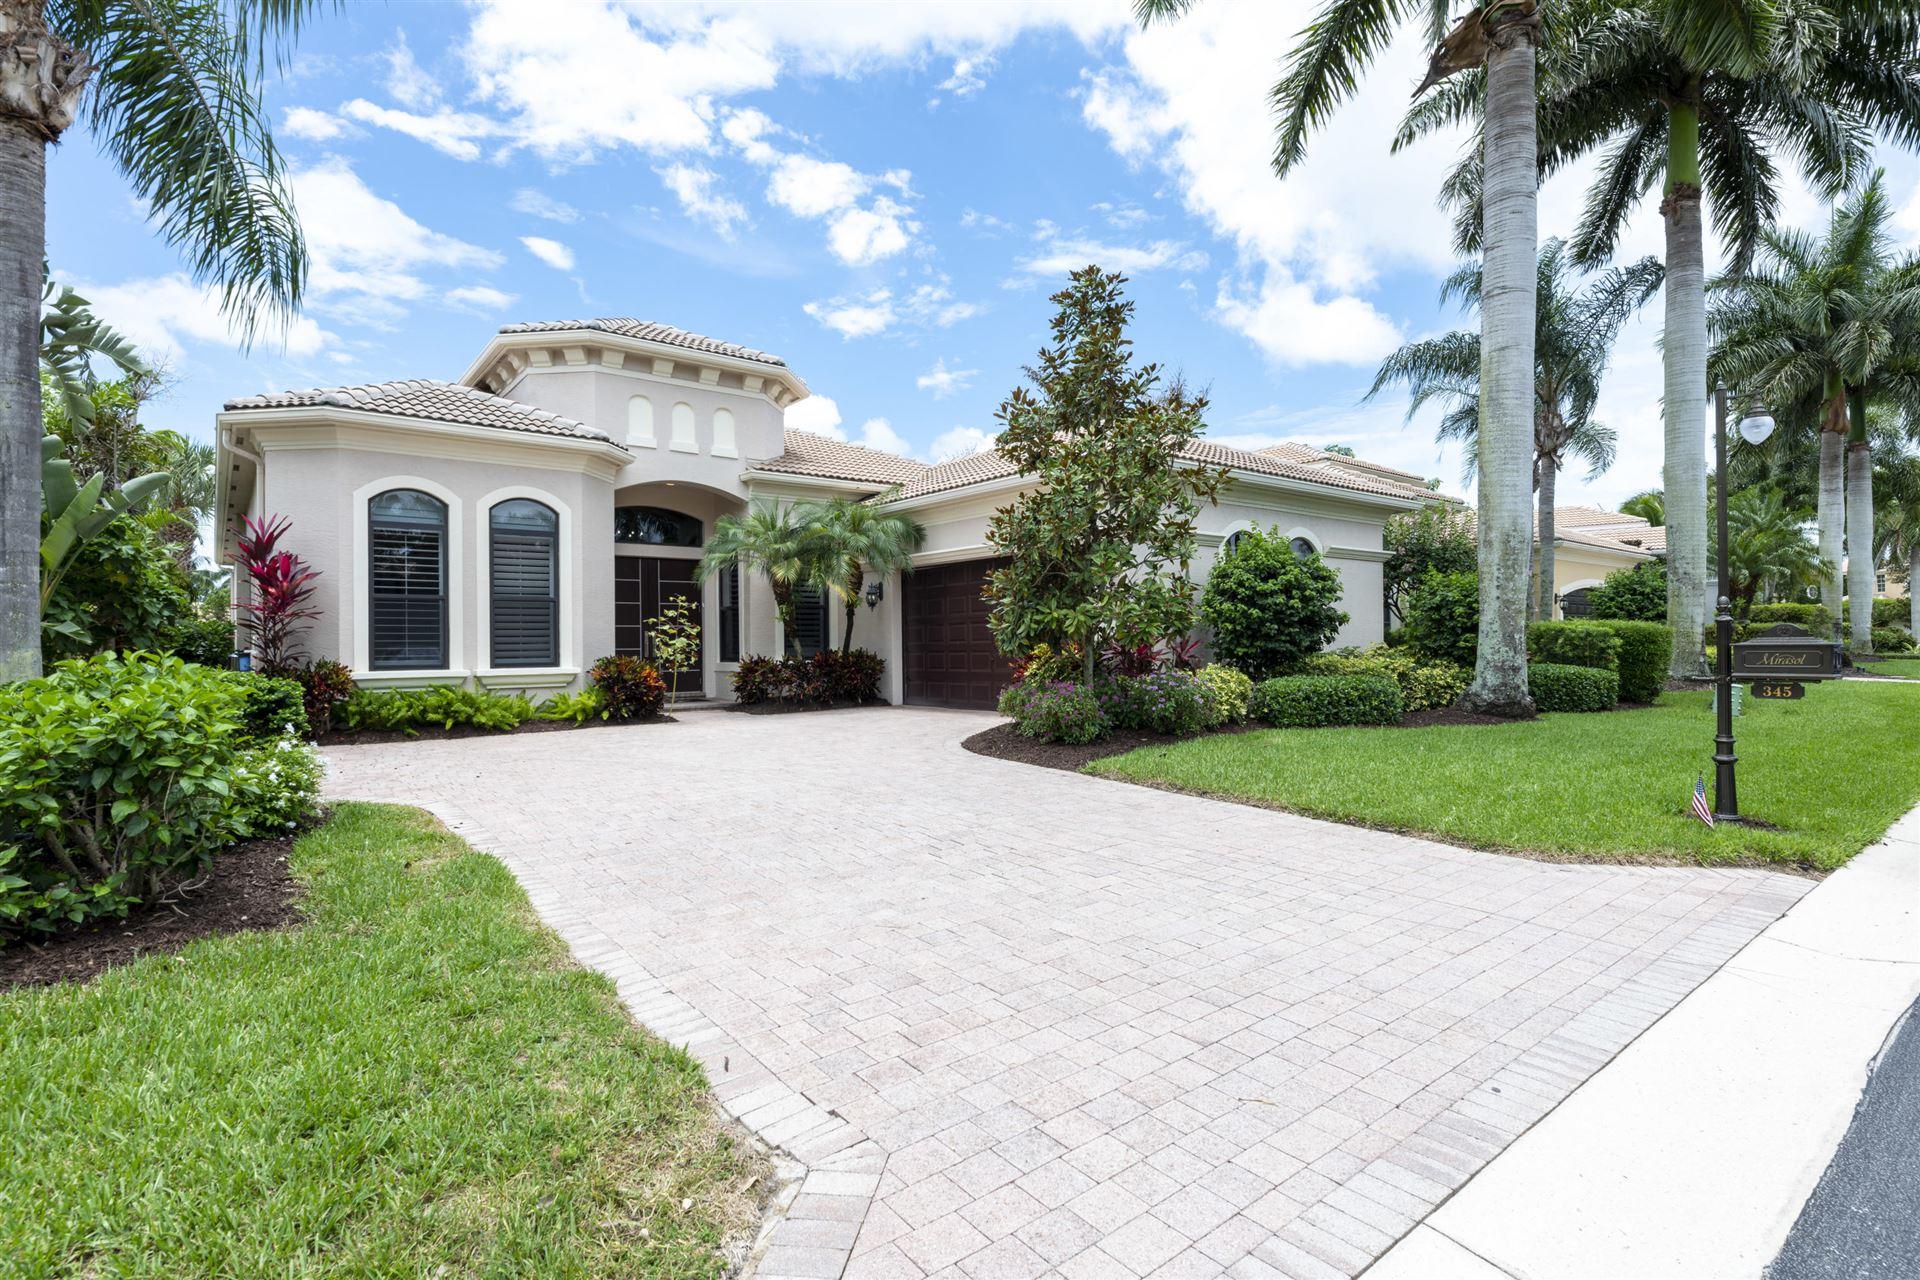 Photo of 345 Vizcaya Drive, Palm Beach Gardens, FL 33418 (MLS # RX-10728454)